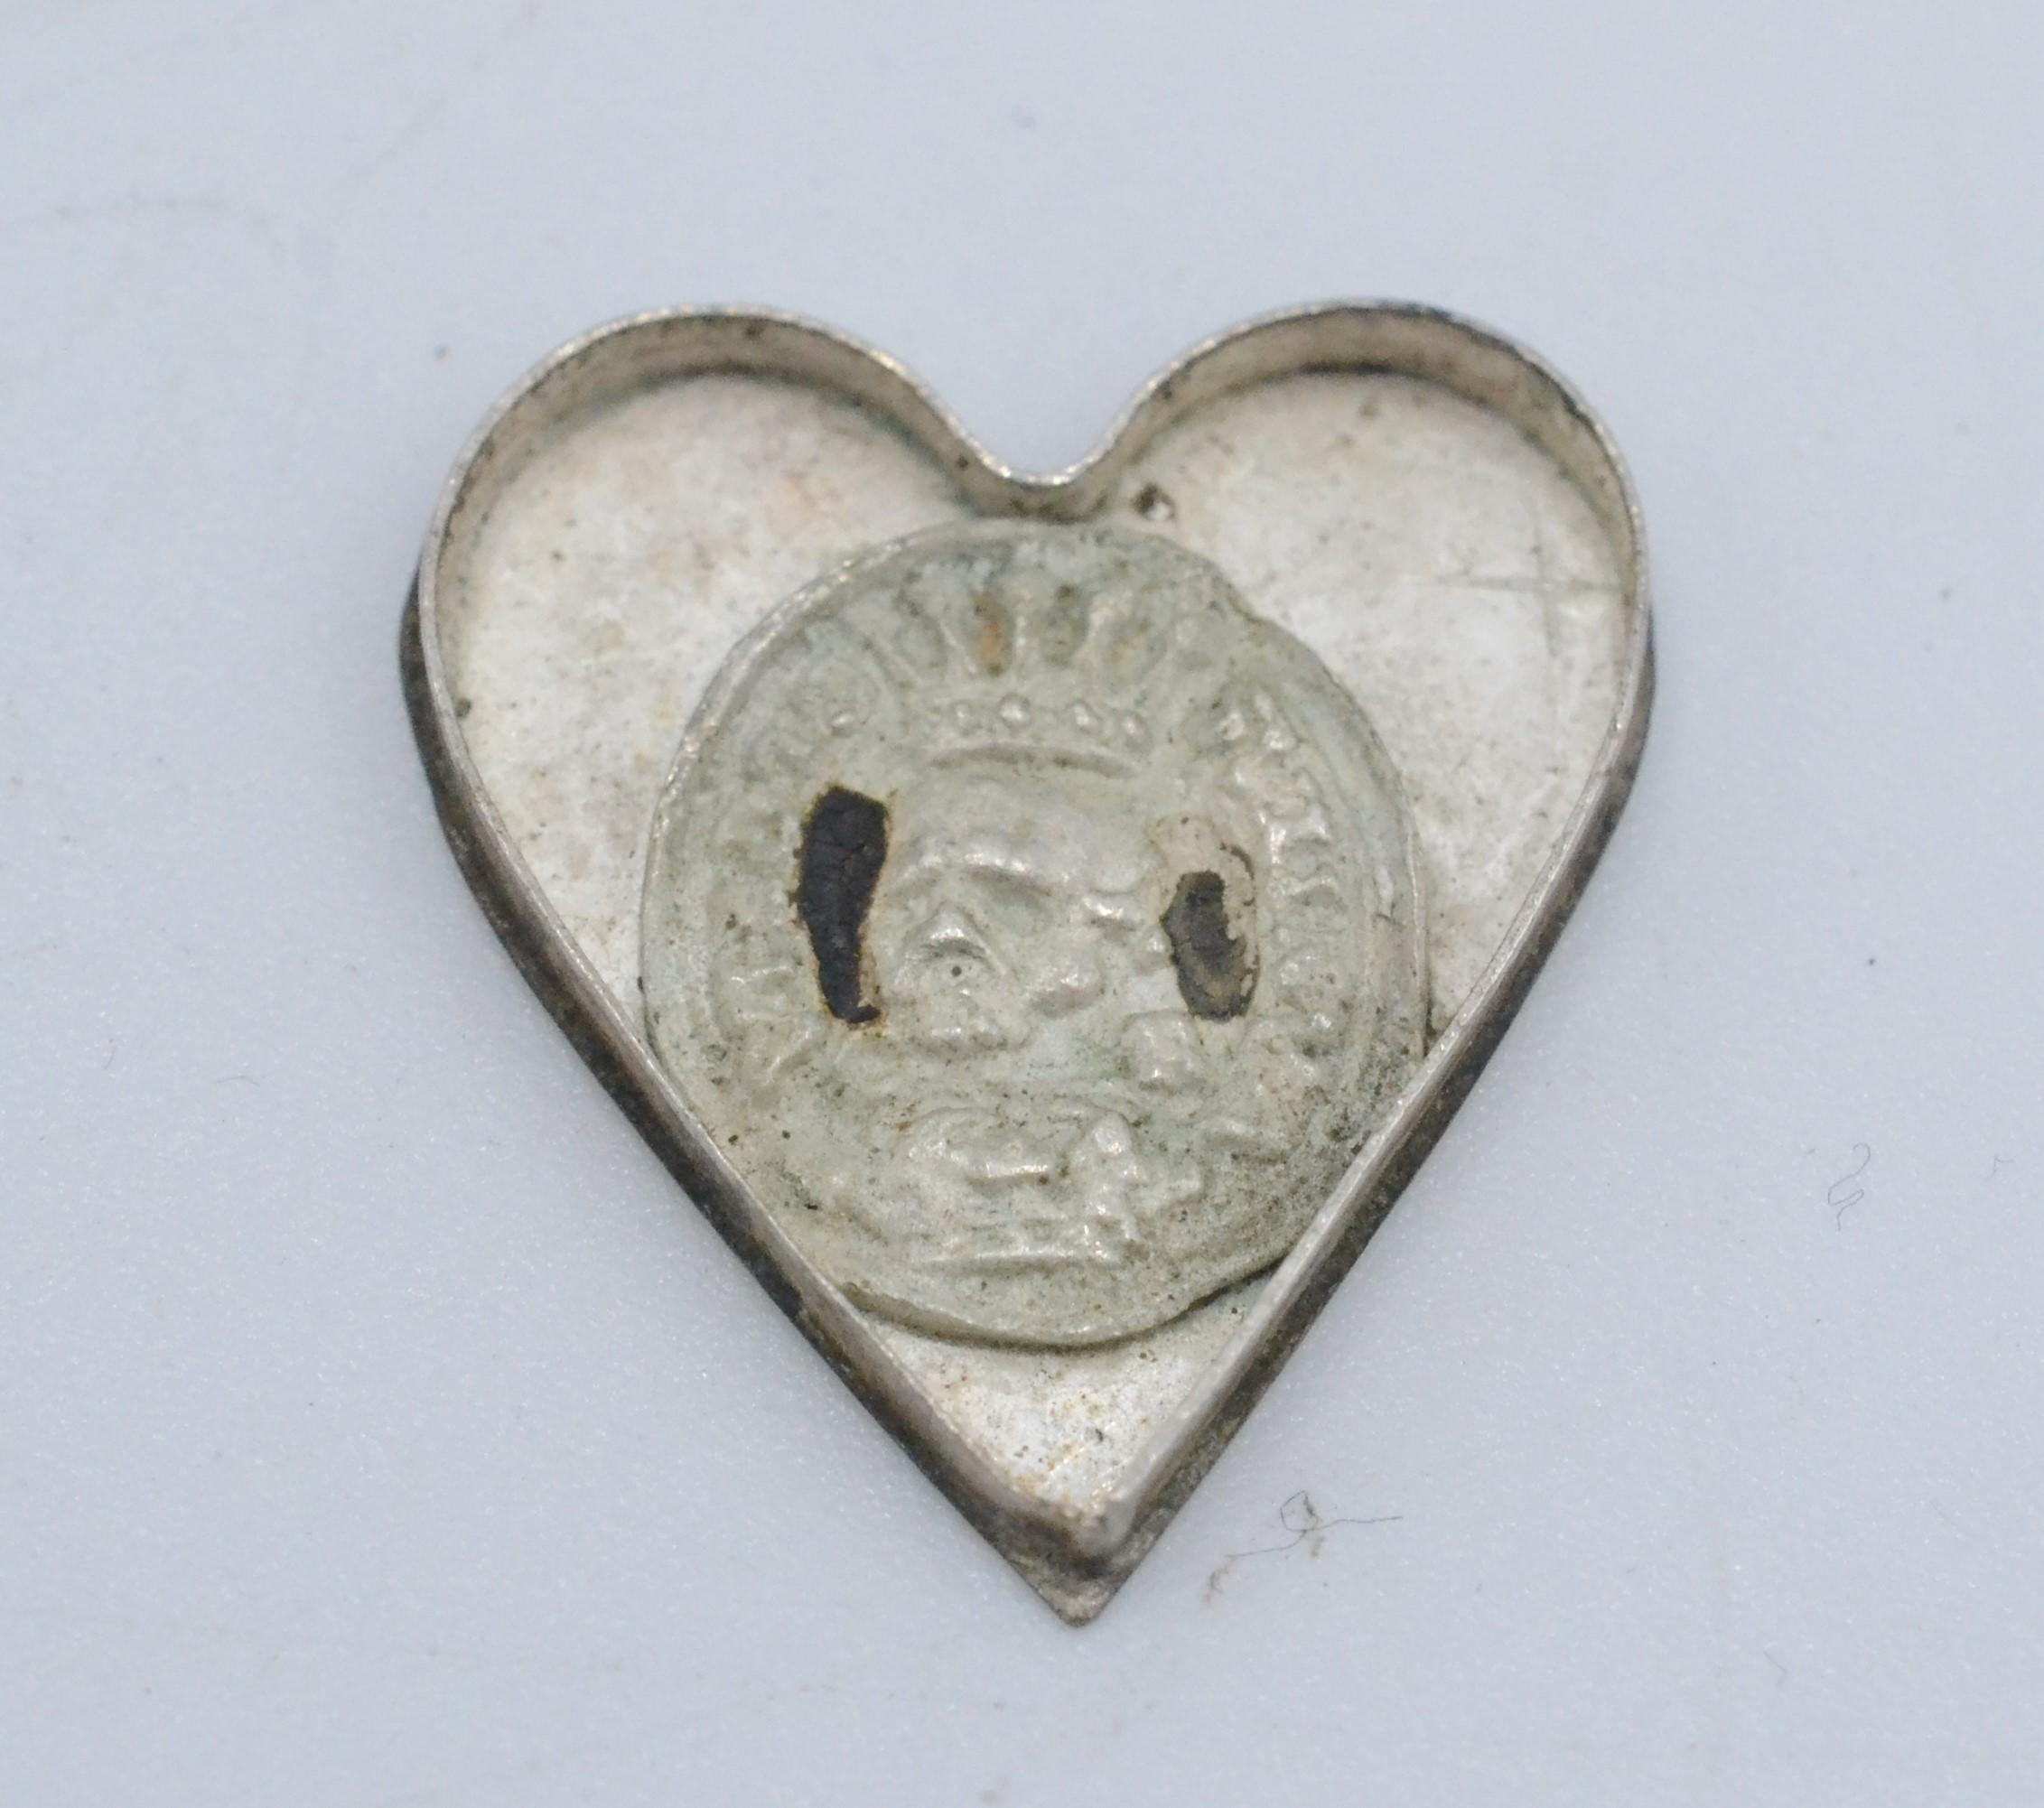 A Royalist heart shaped silver locket, - Image 4 of 4